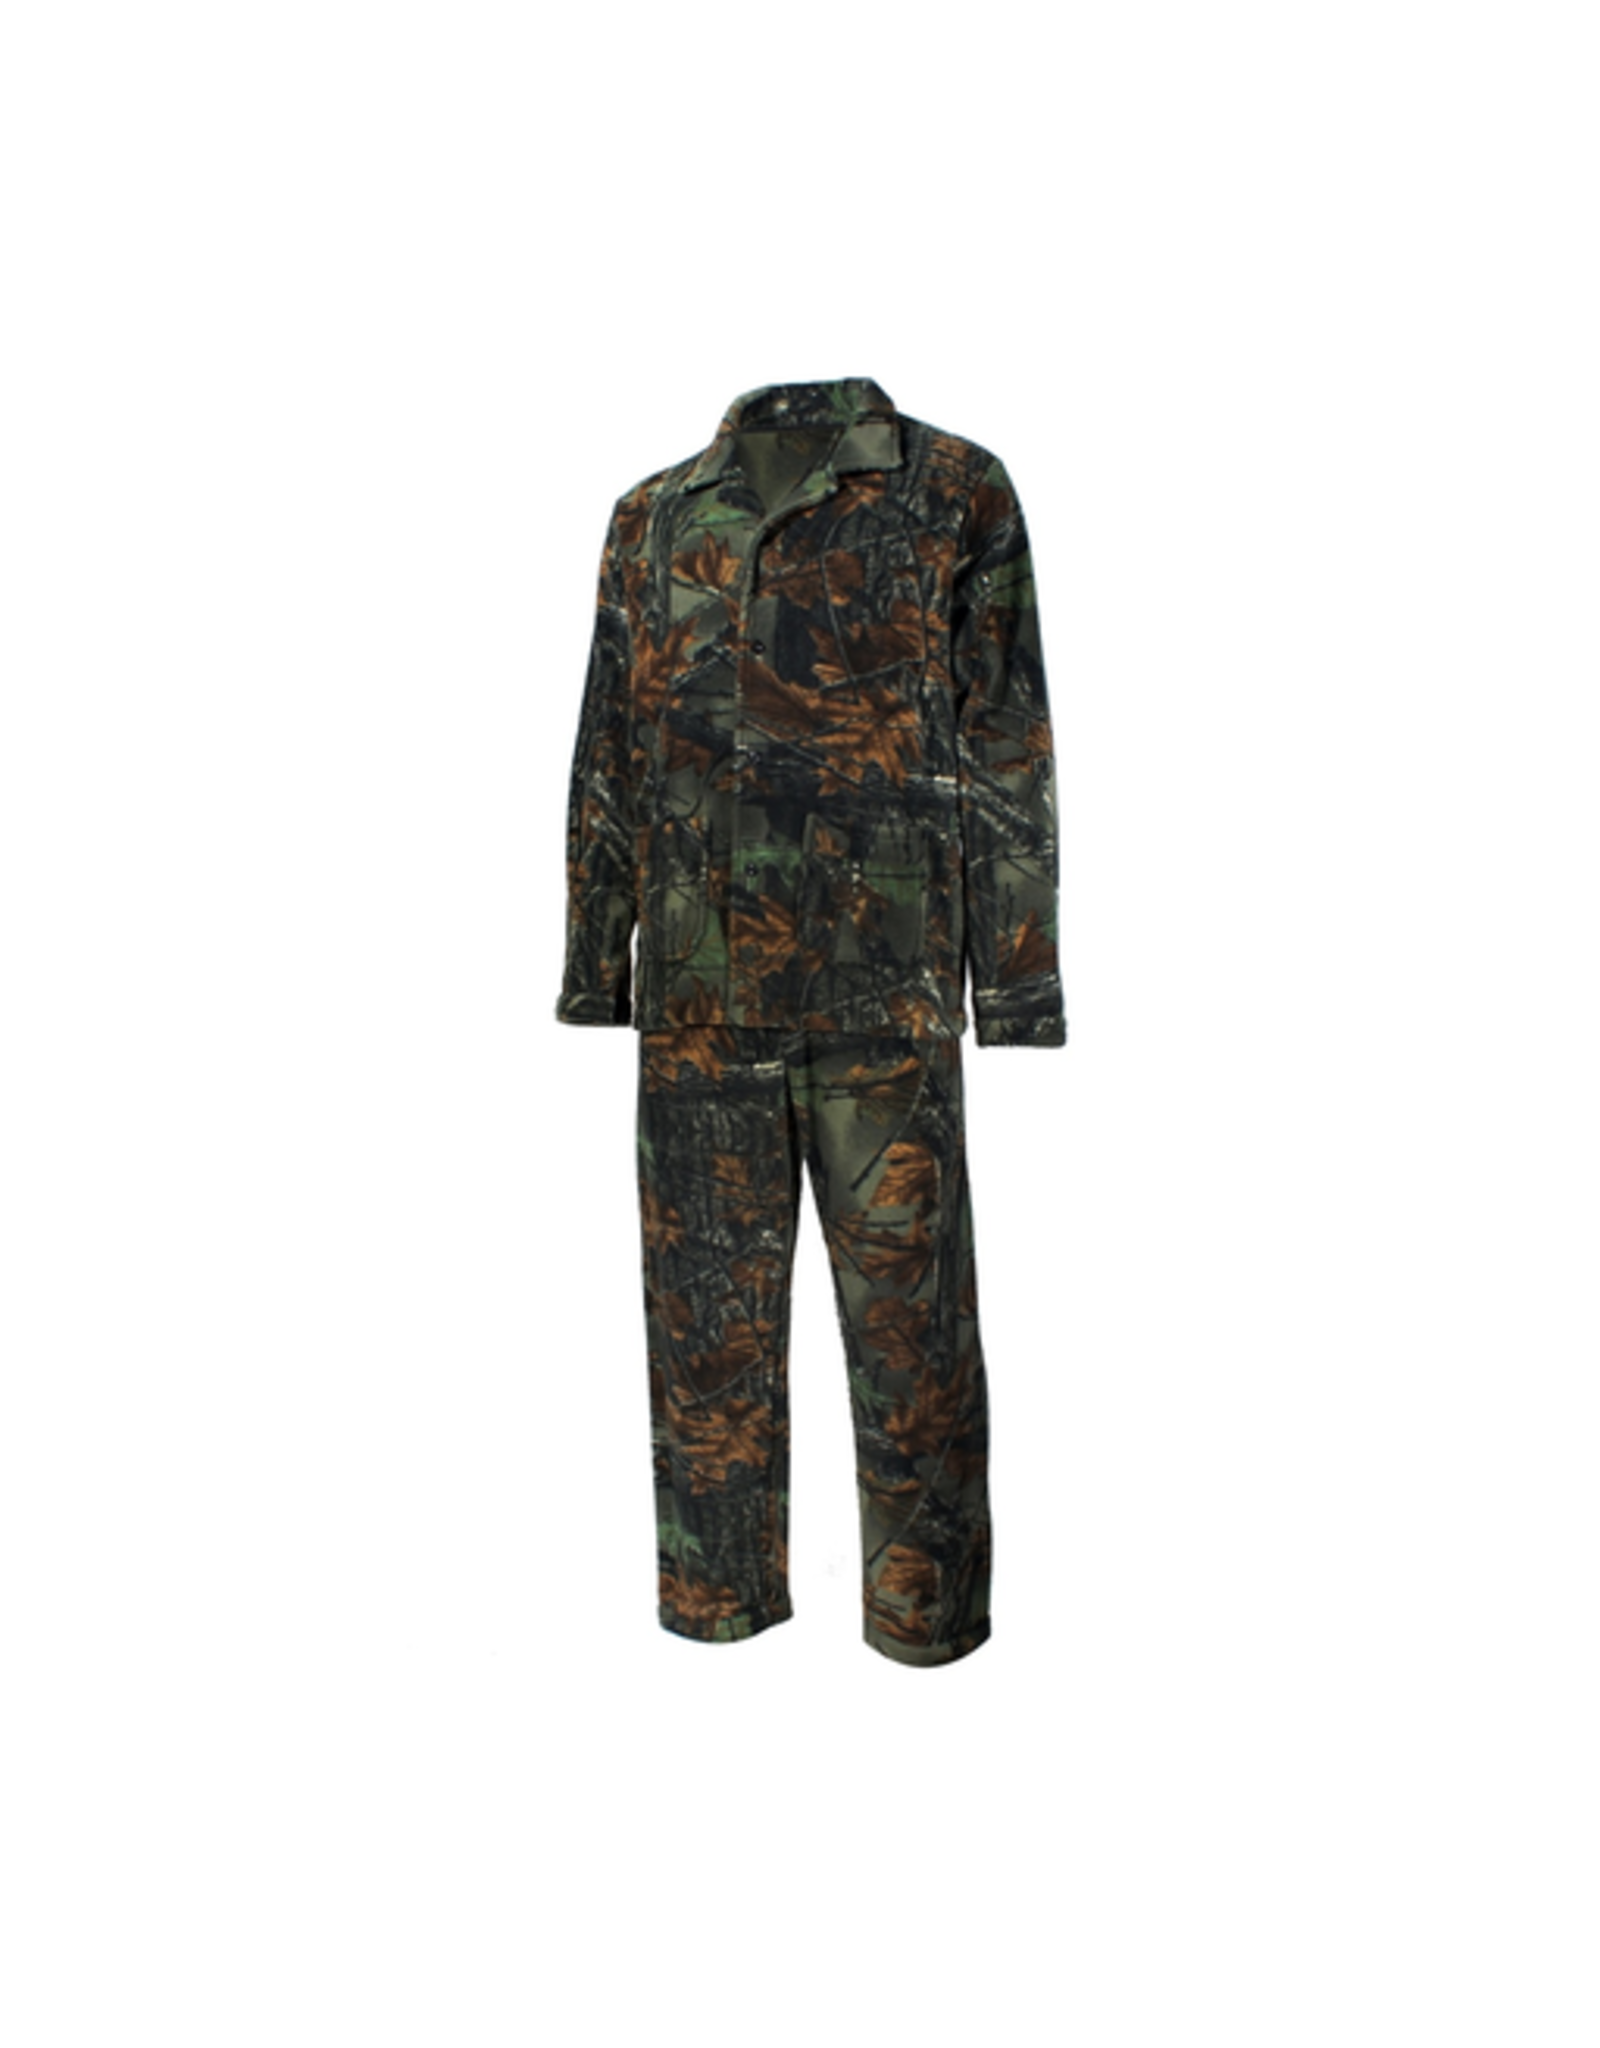 GKS GKS Mens Fleece Pyjamas